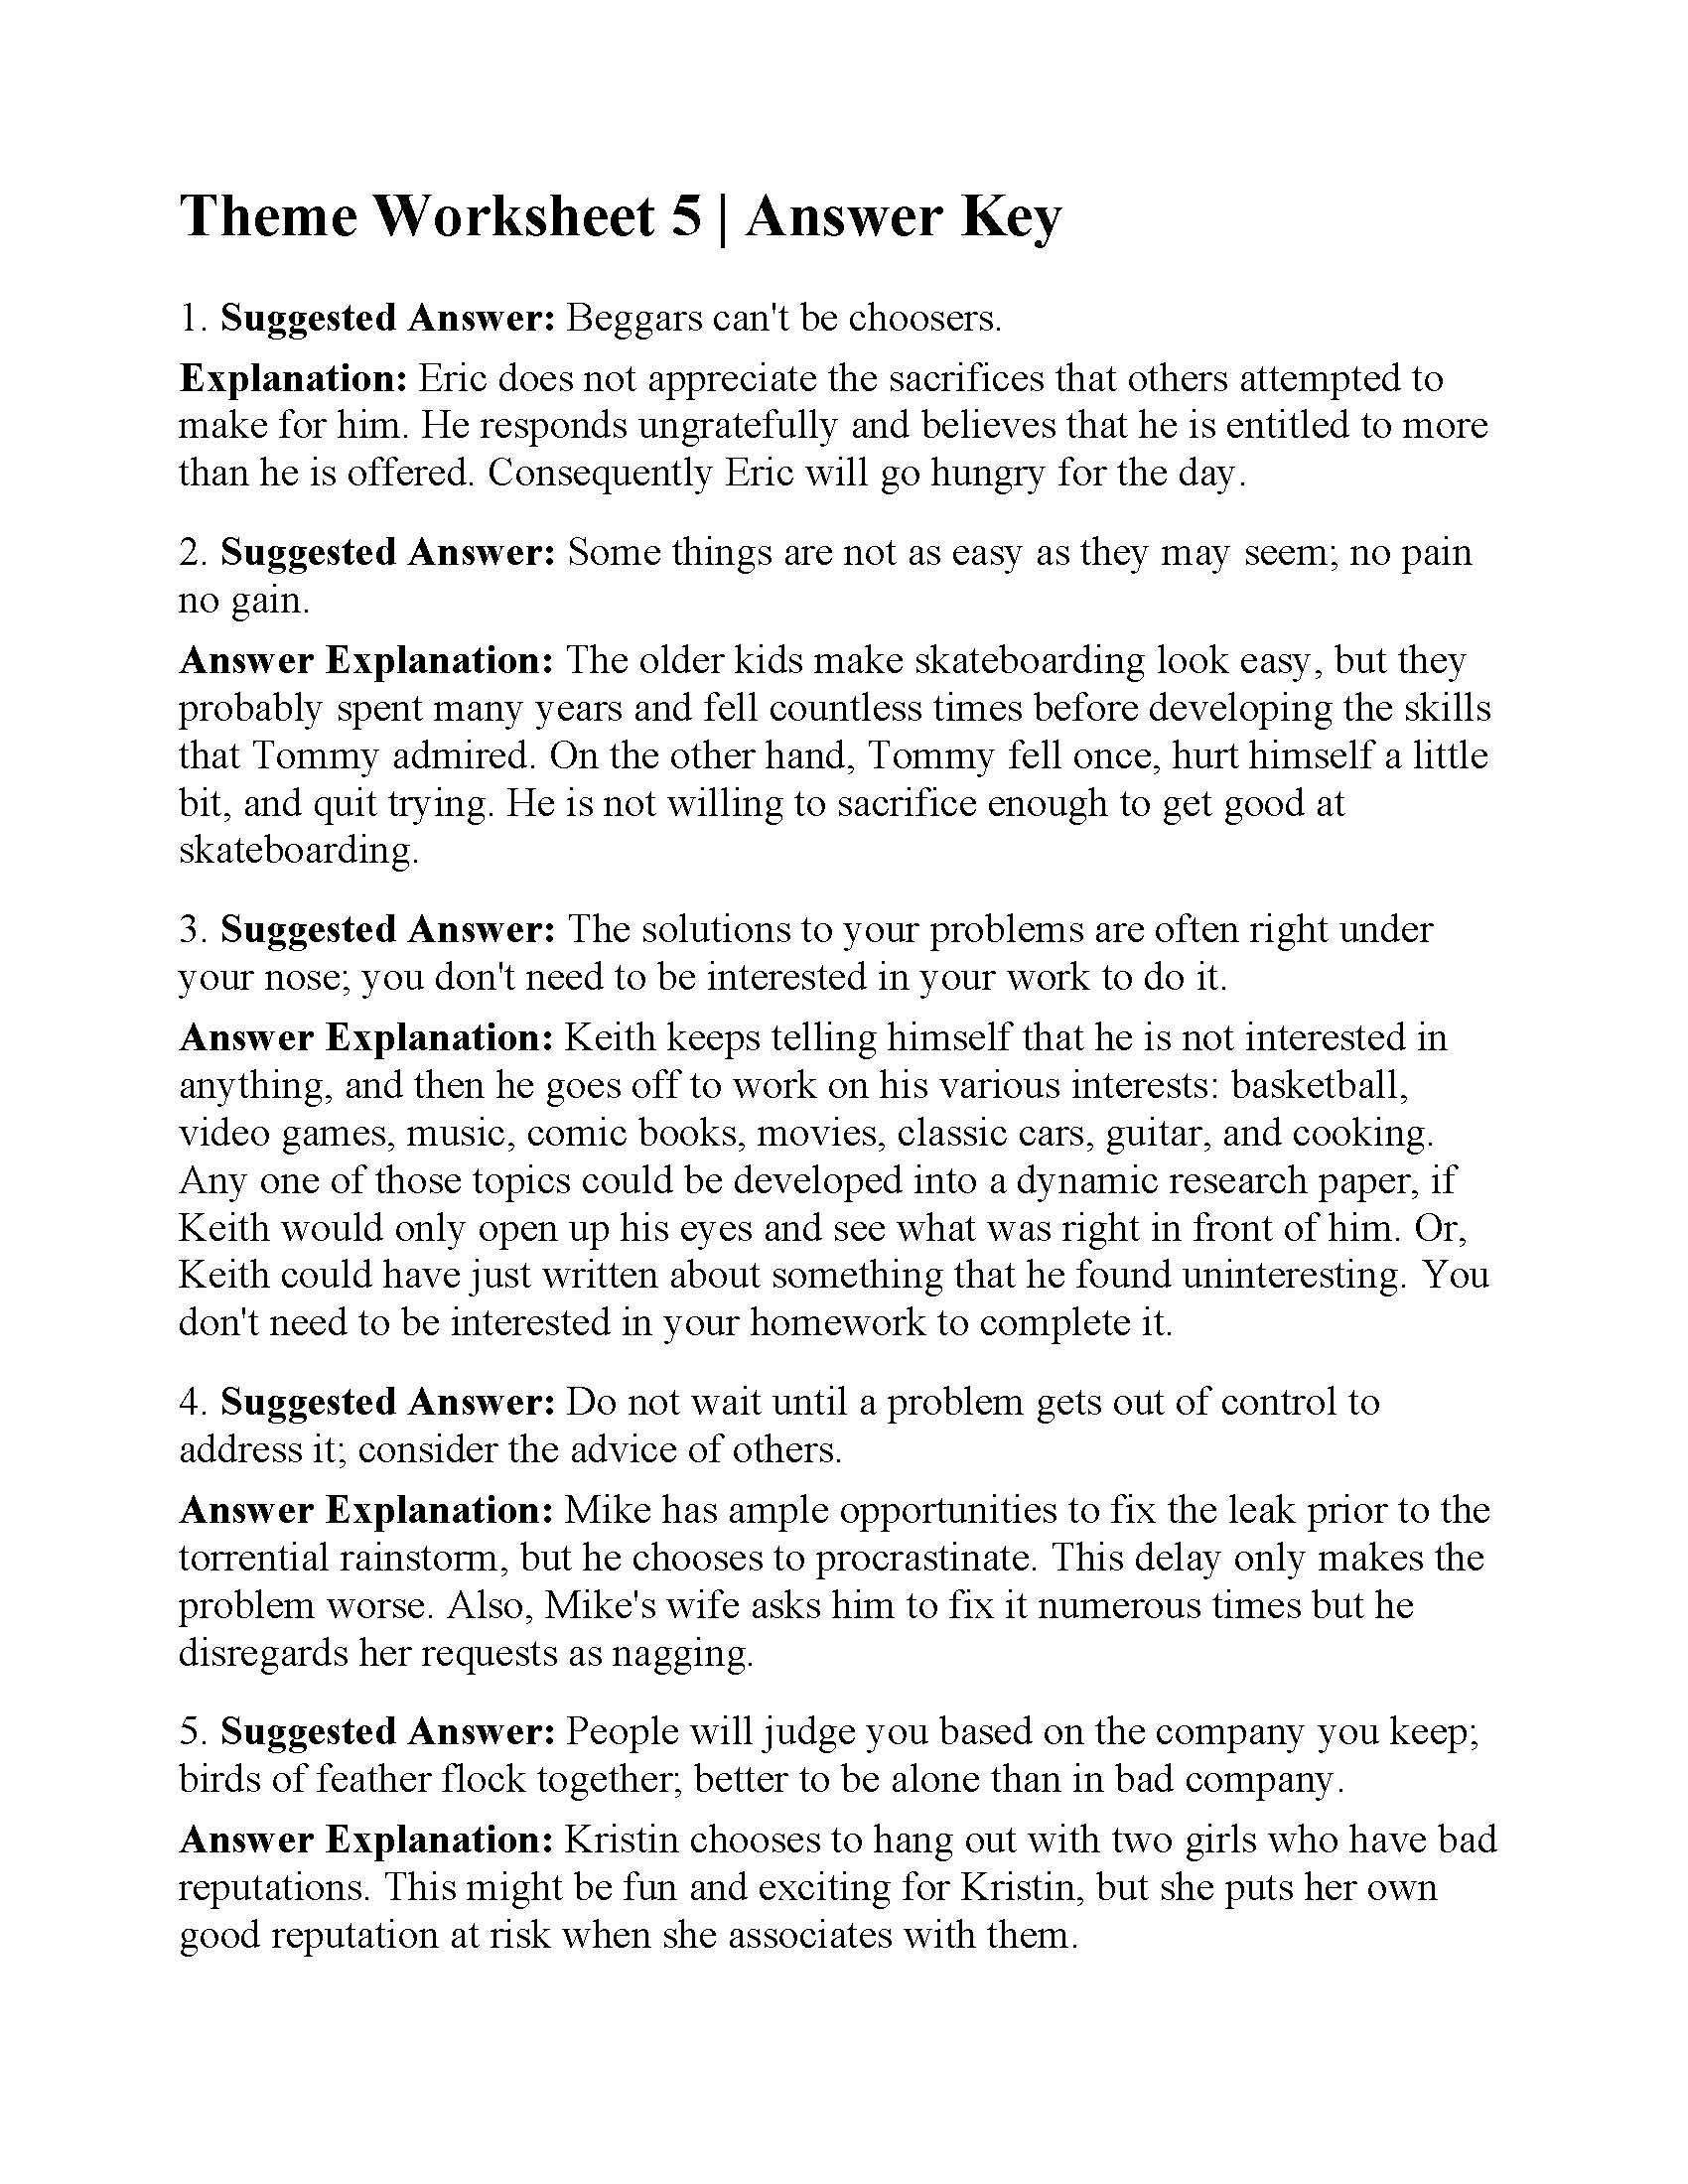 Theme Worksheets for 5th Grade theme Worksheet 5